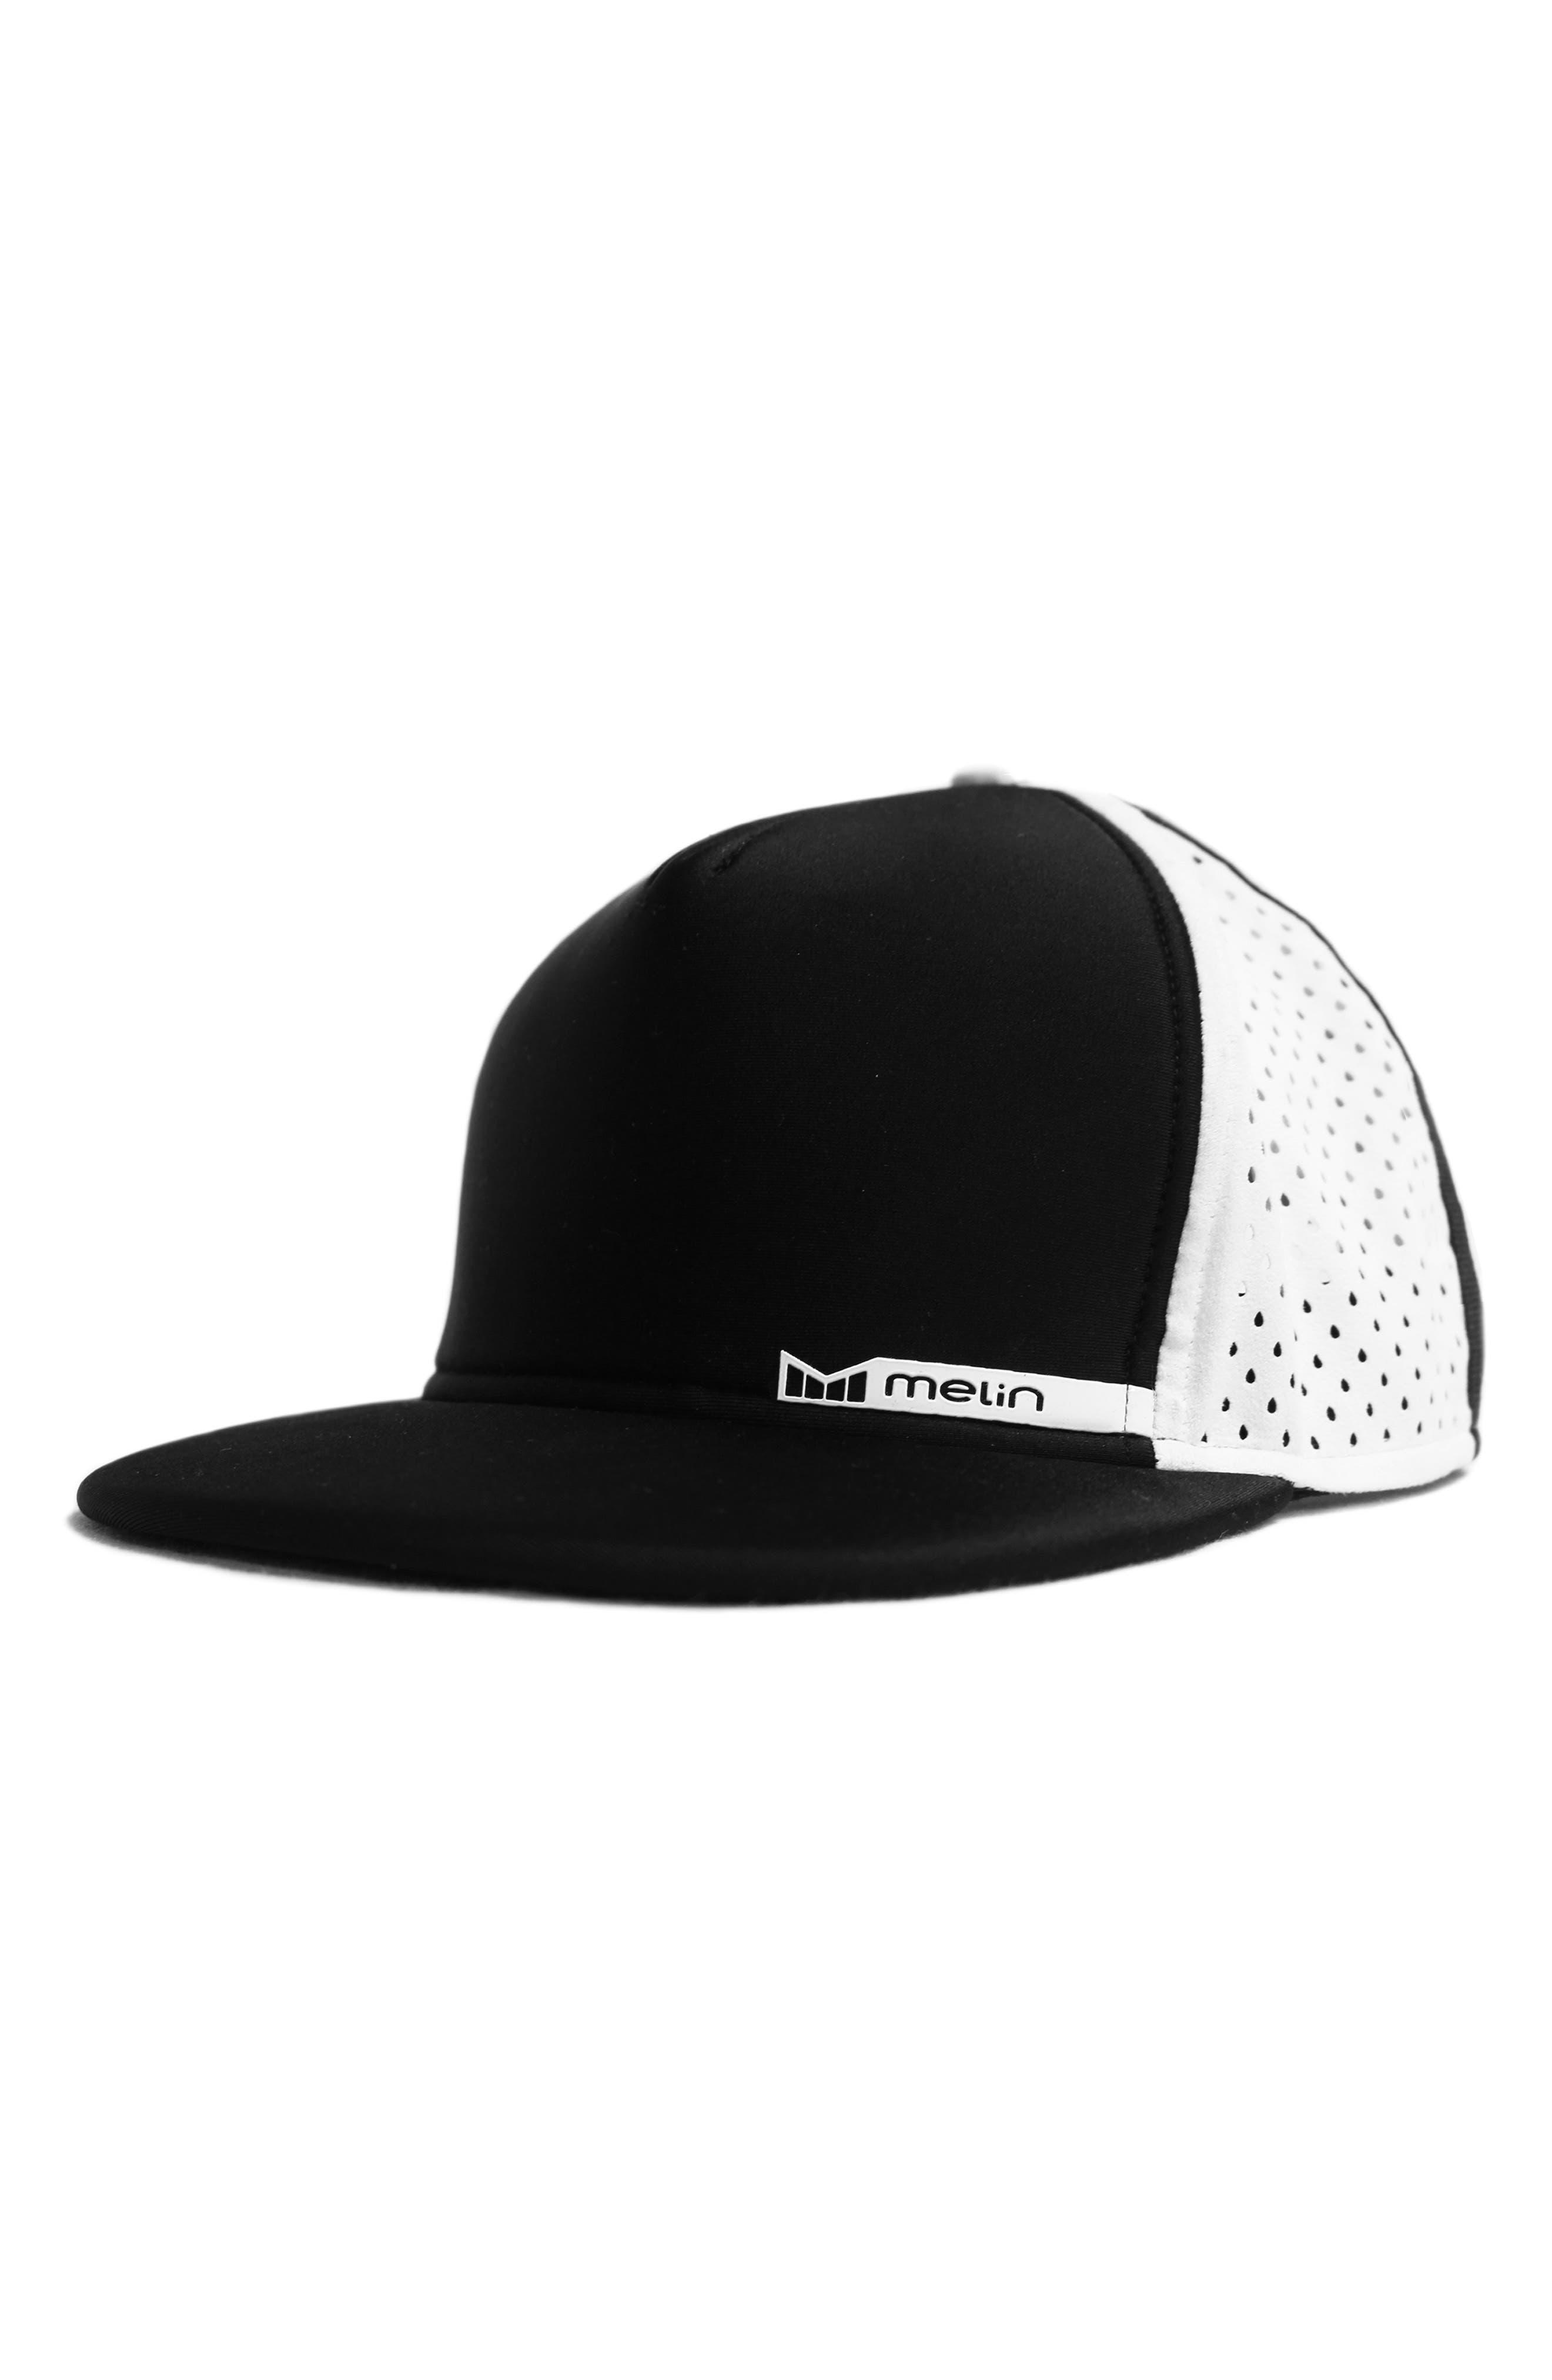 Main Image - Melin 'Amphibian' Split Fit Snapback Baseball Cap